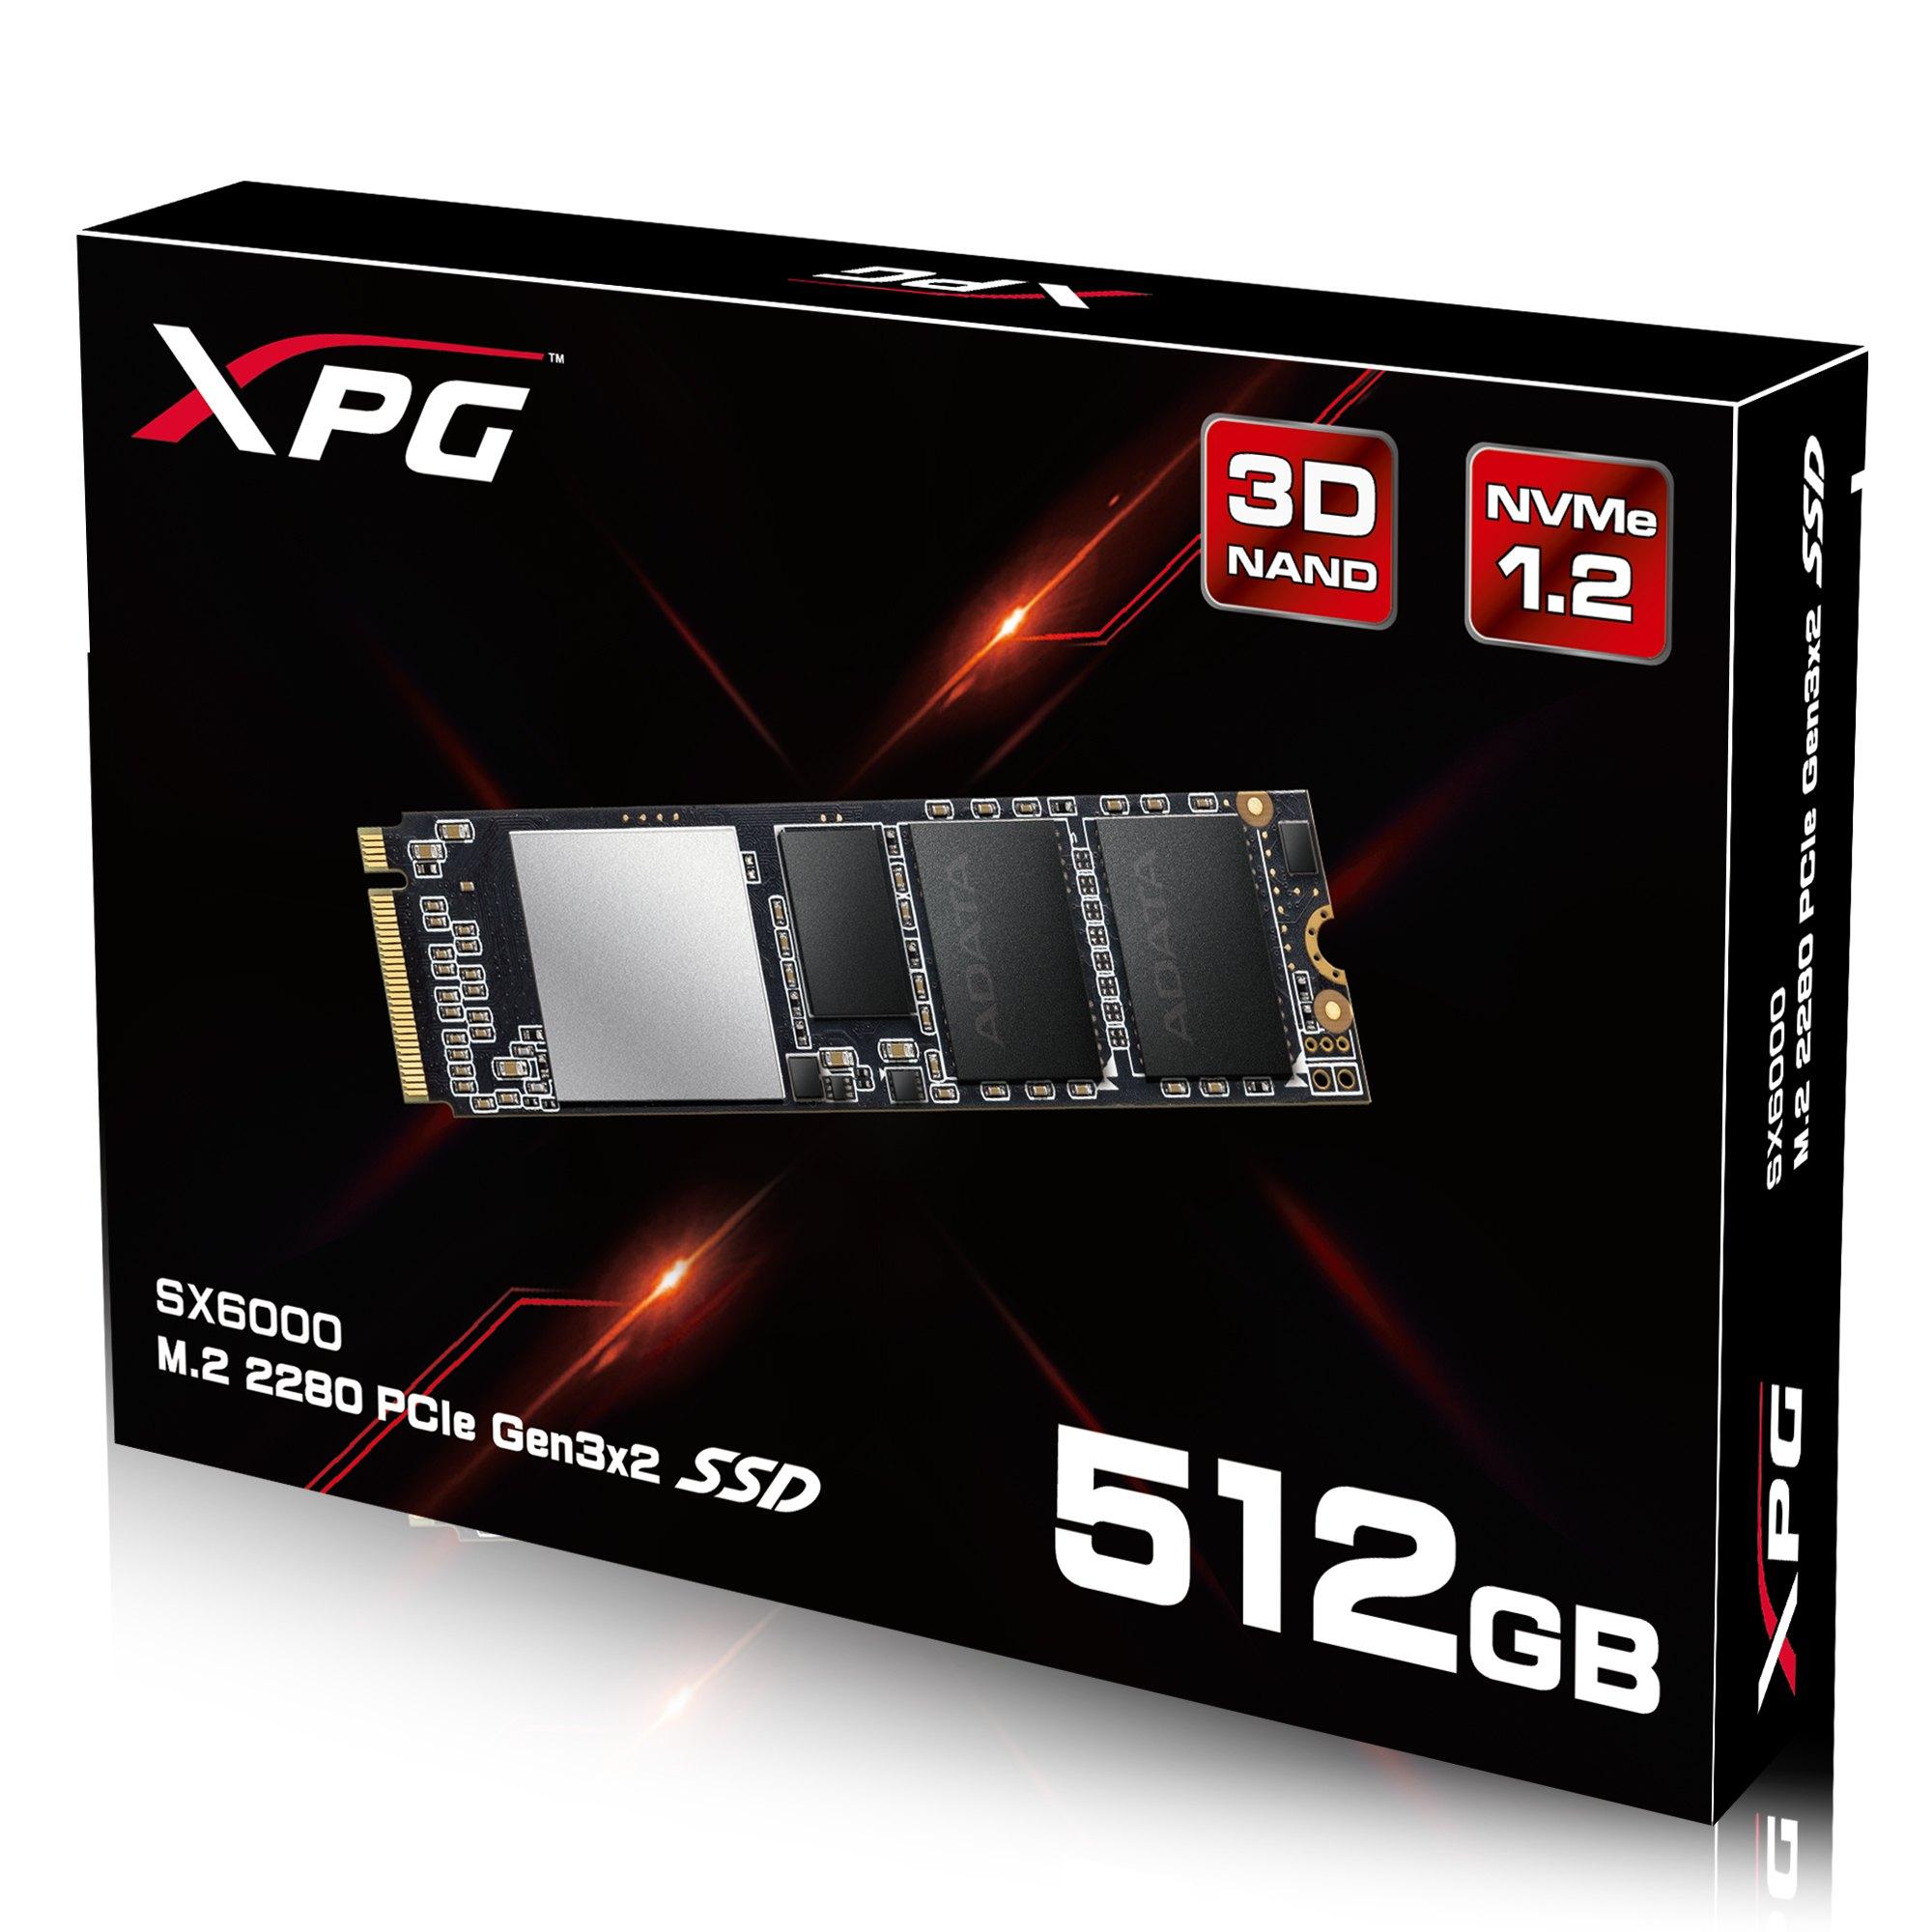 512GB ADATA XPG SX6000 PCIe M.2 2280 Solid State Drive SSD w/ DIY Heatsink $134.99 + Free Shipping